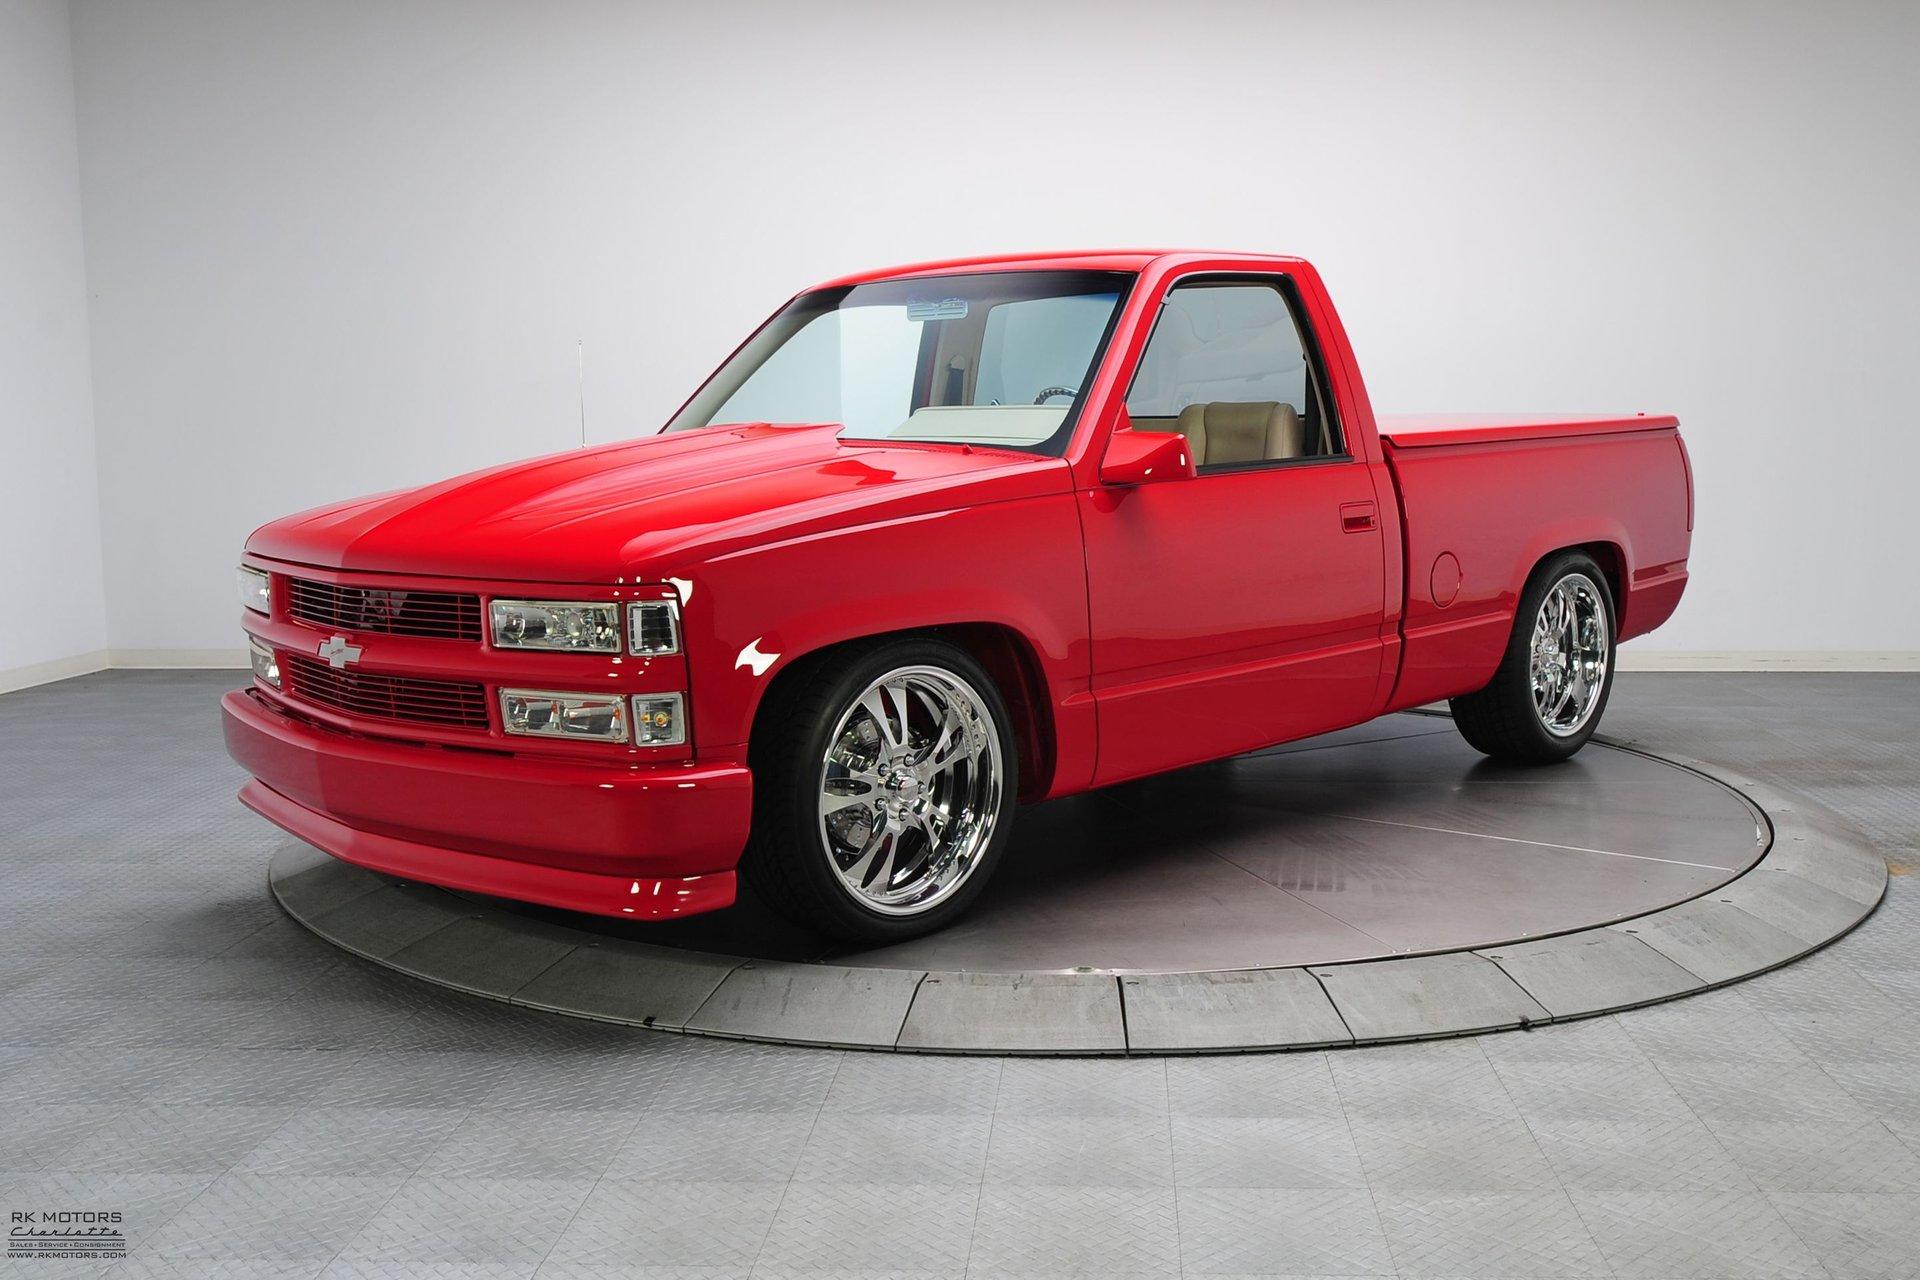 133085 1992 Chevrolet C/1500 RK Motors Classic Cars for Sale